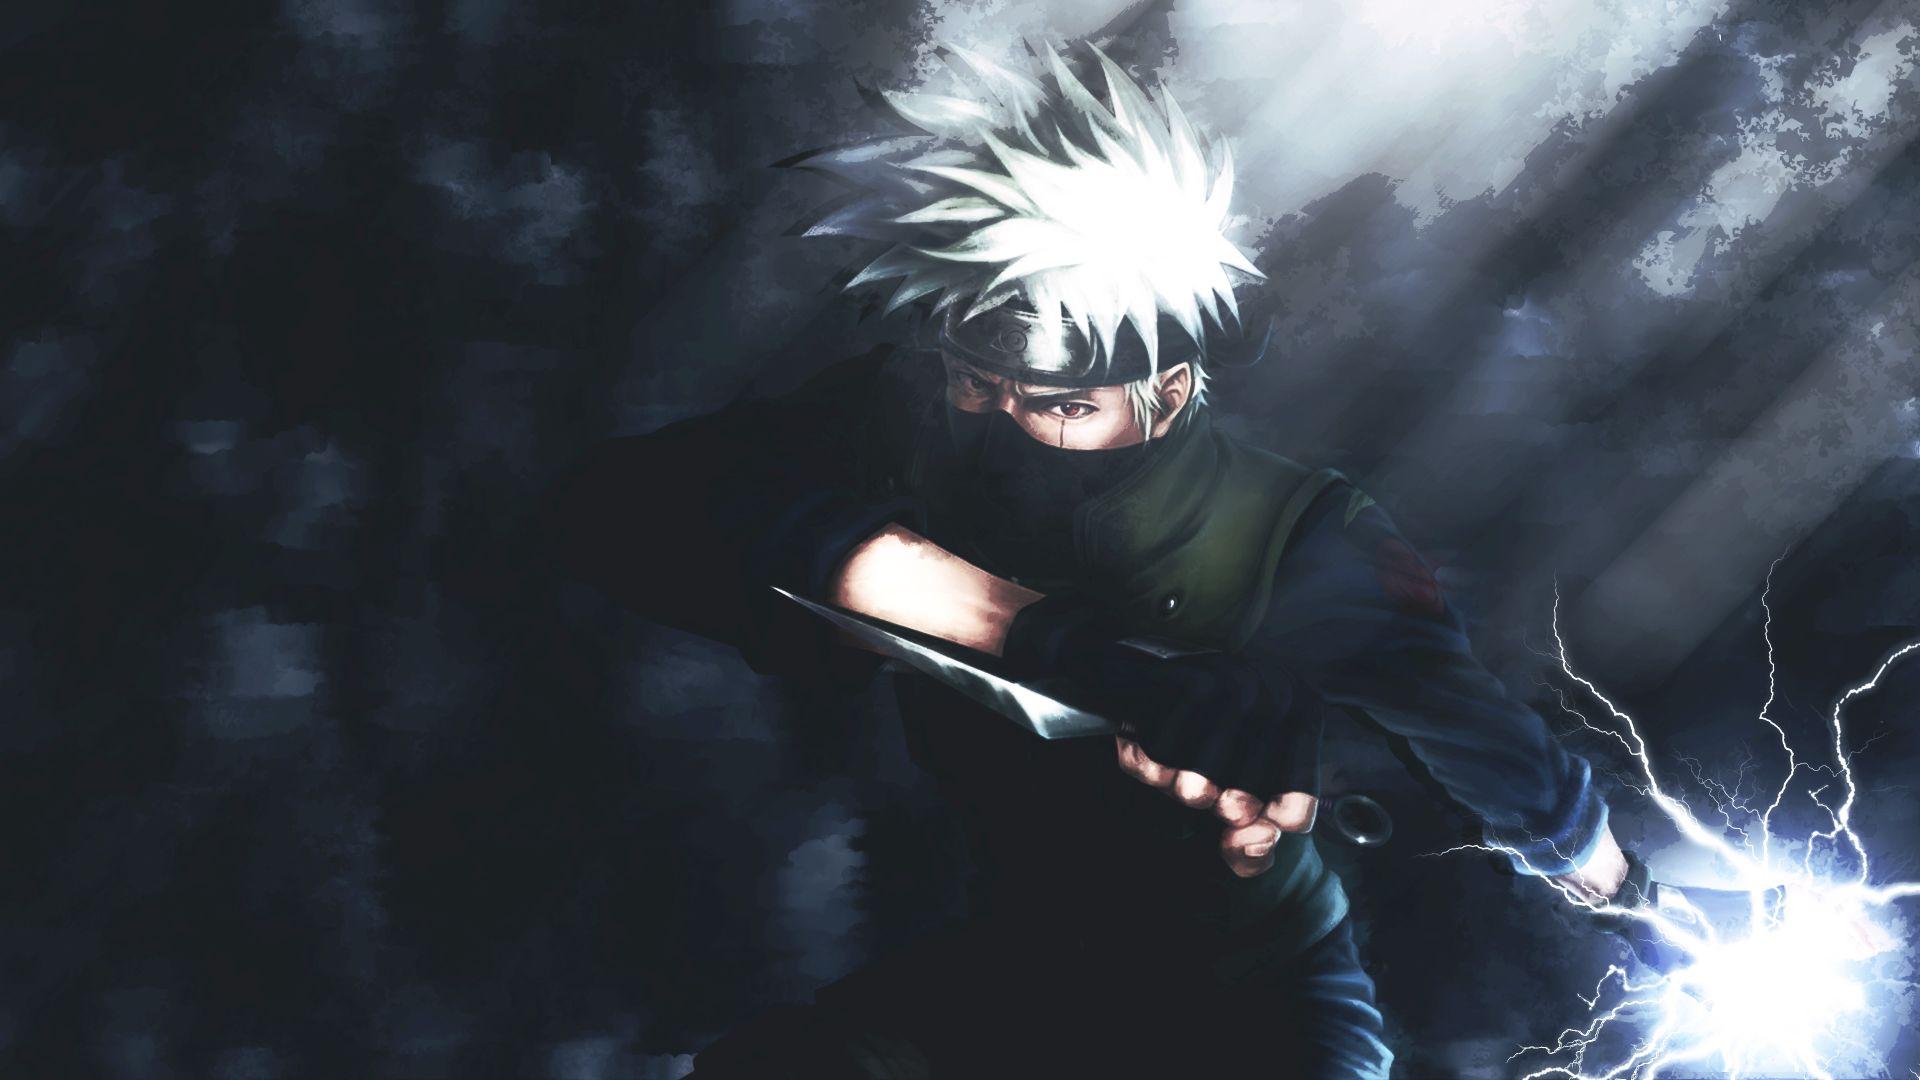 Naruto hd, Nice Wallpaper